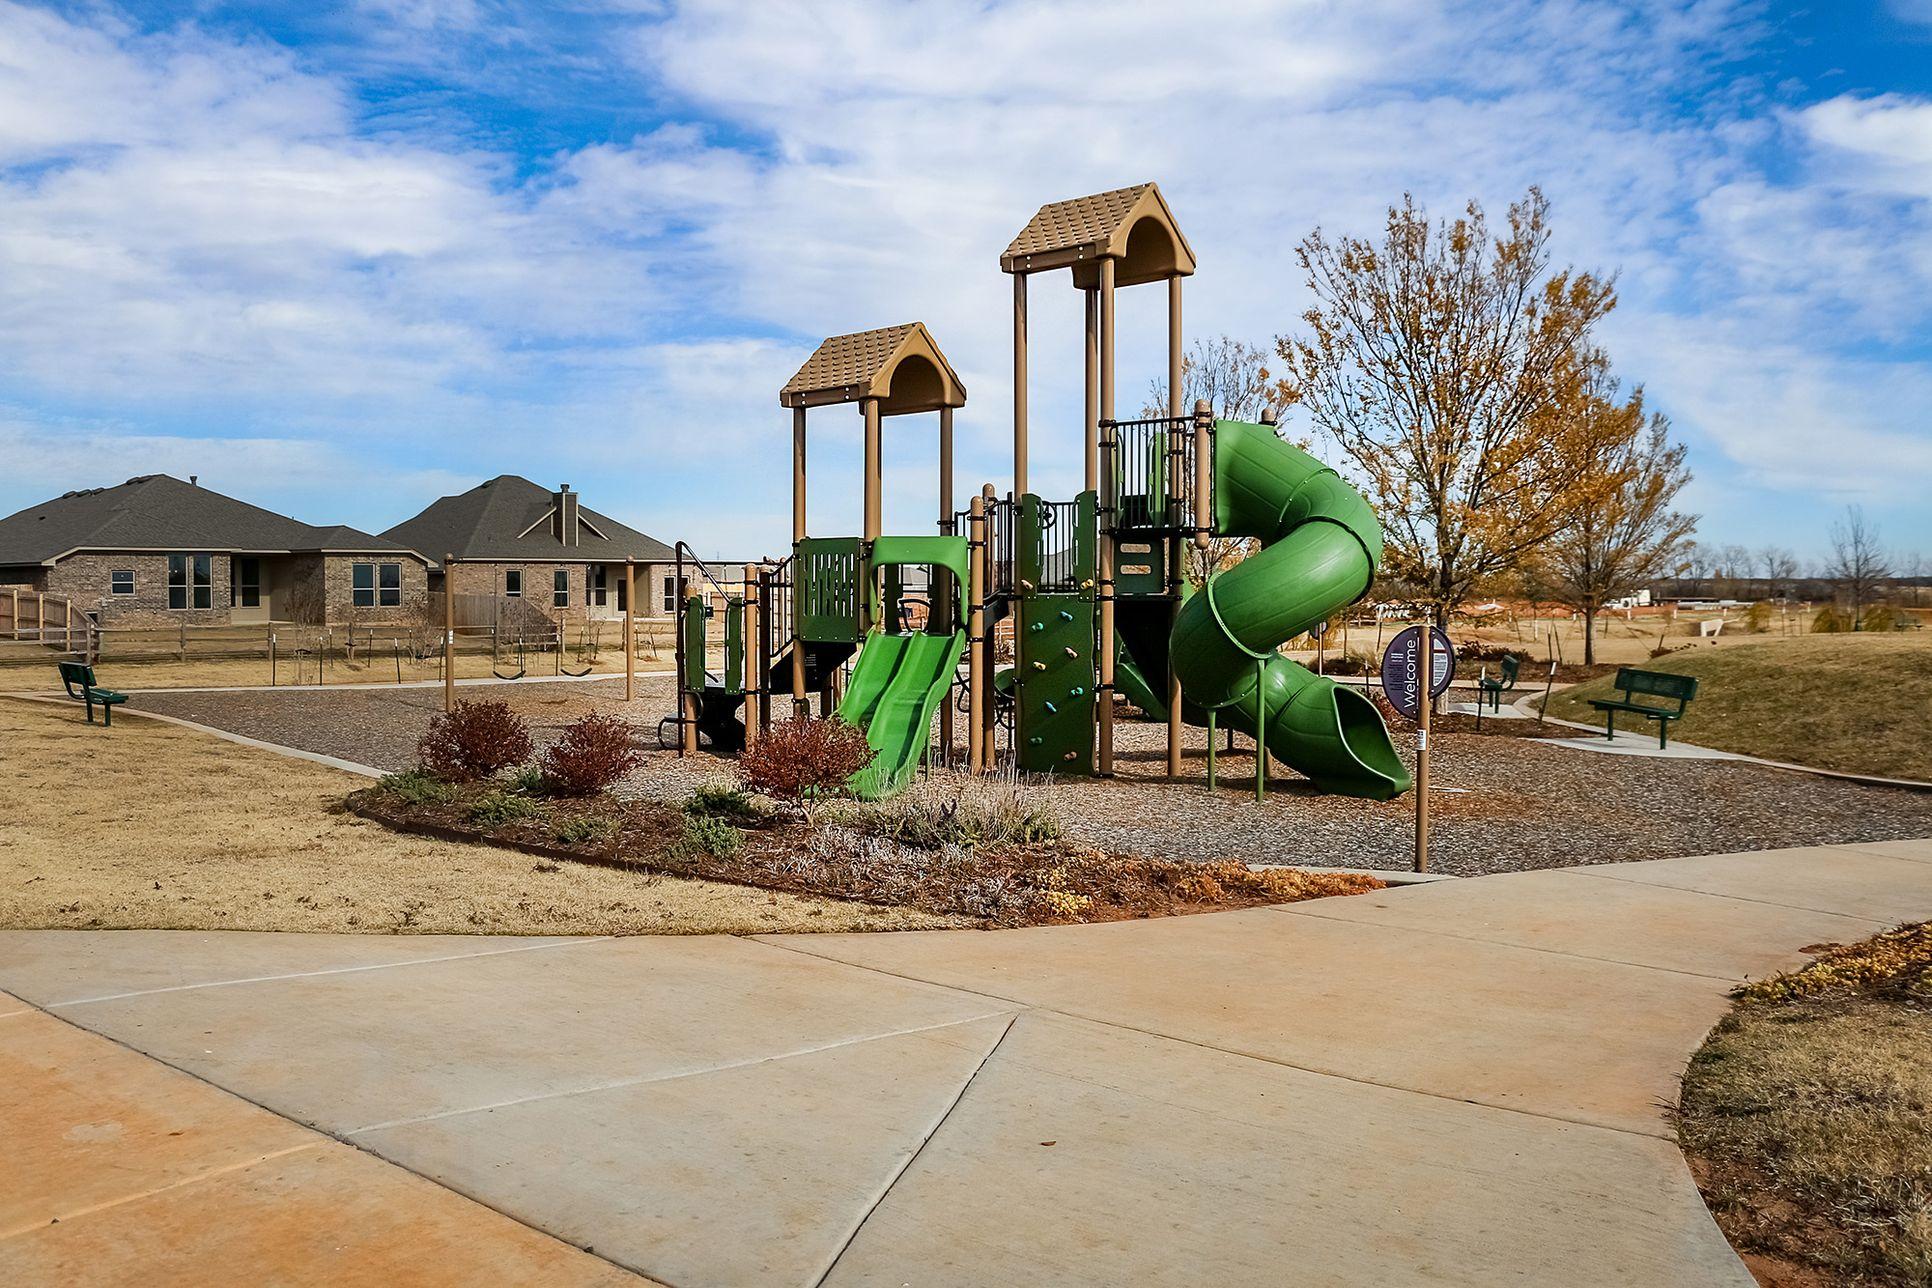 Castlewood Trails Playground